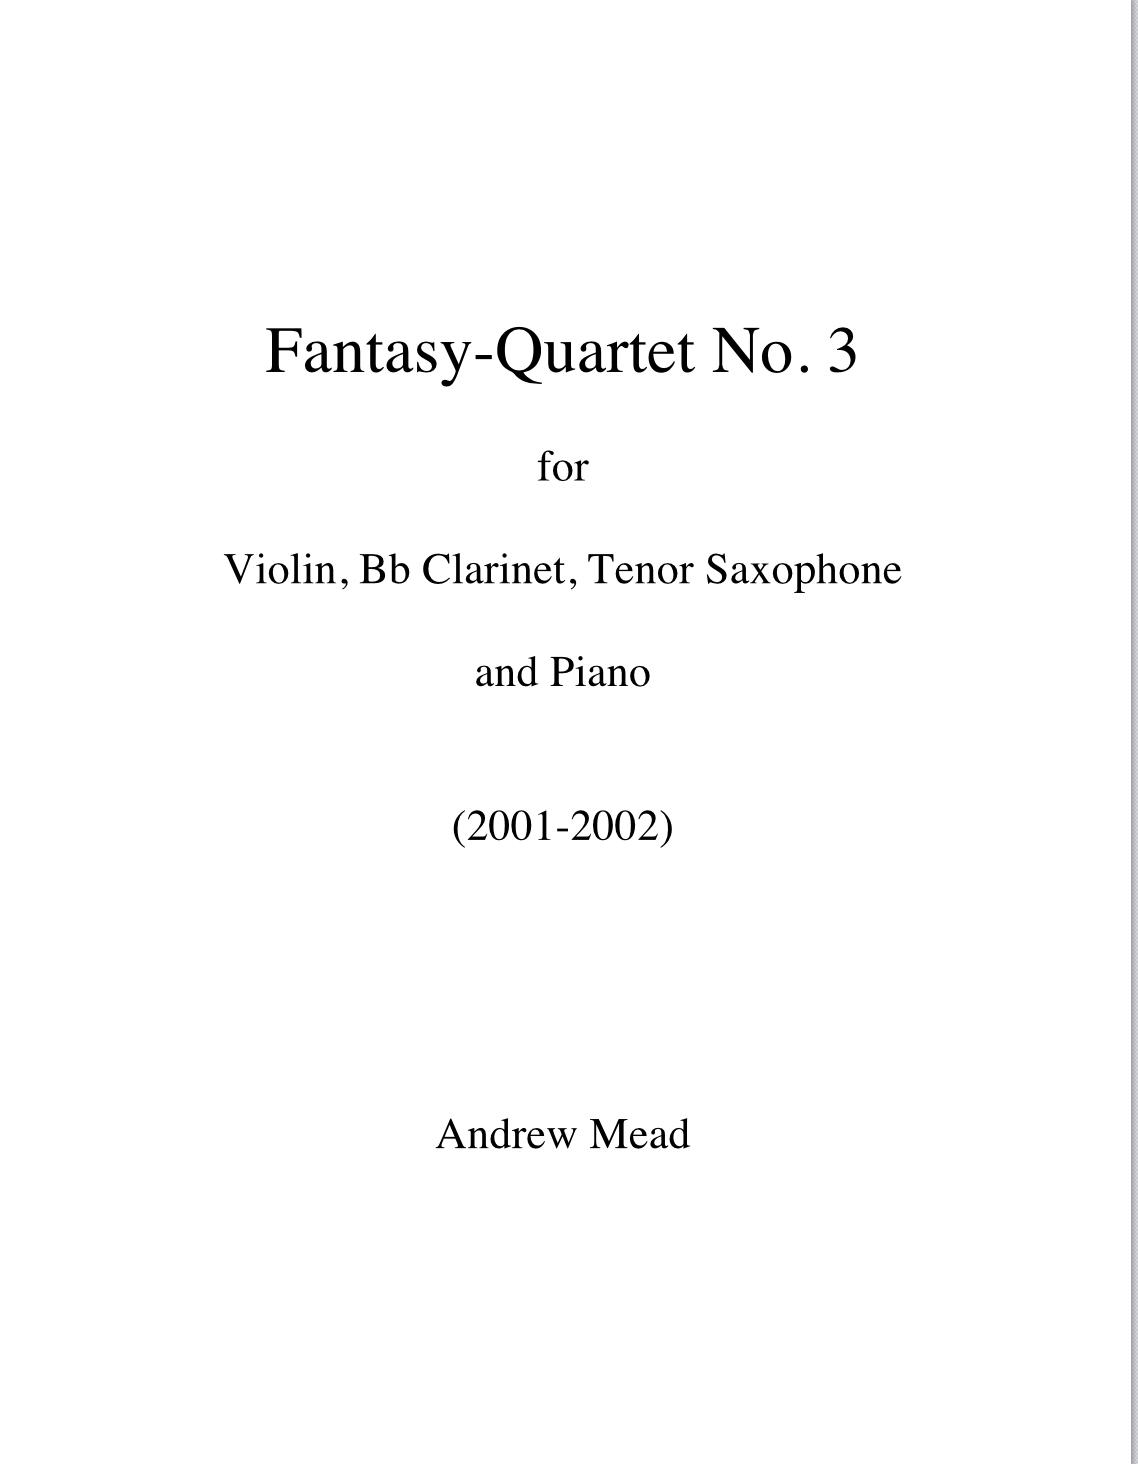 Fantasy Quartet No. 3 by Andrew Mead